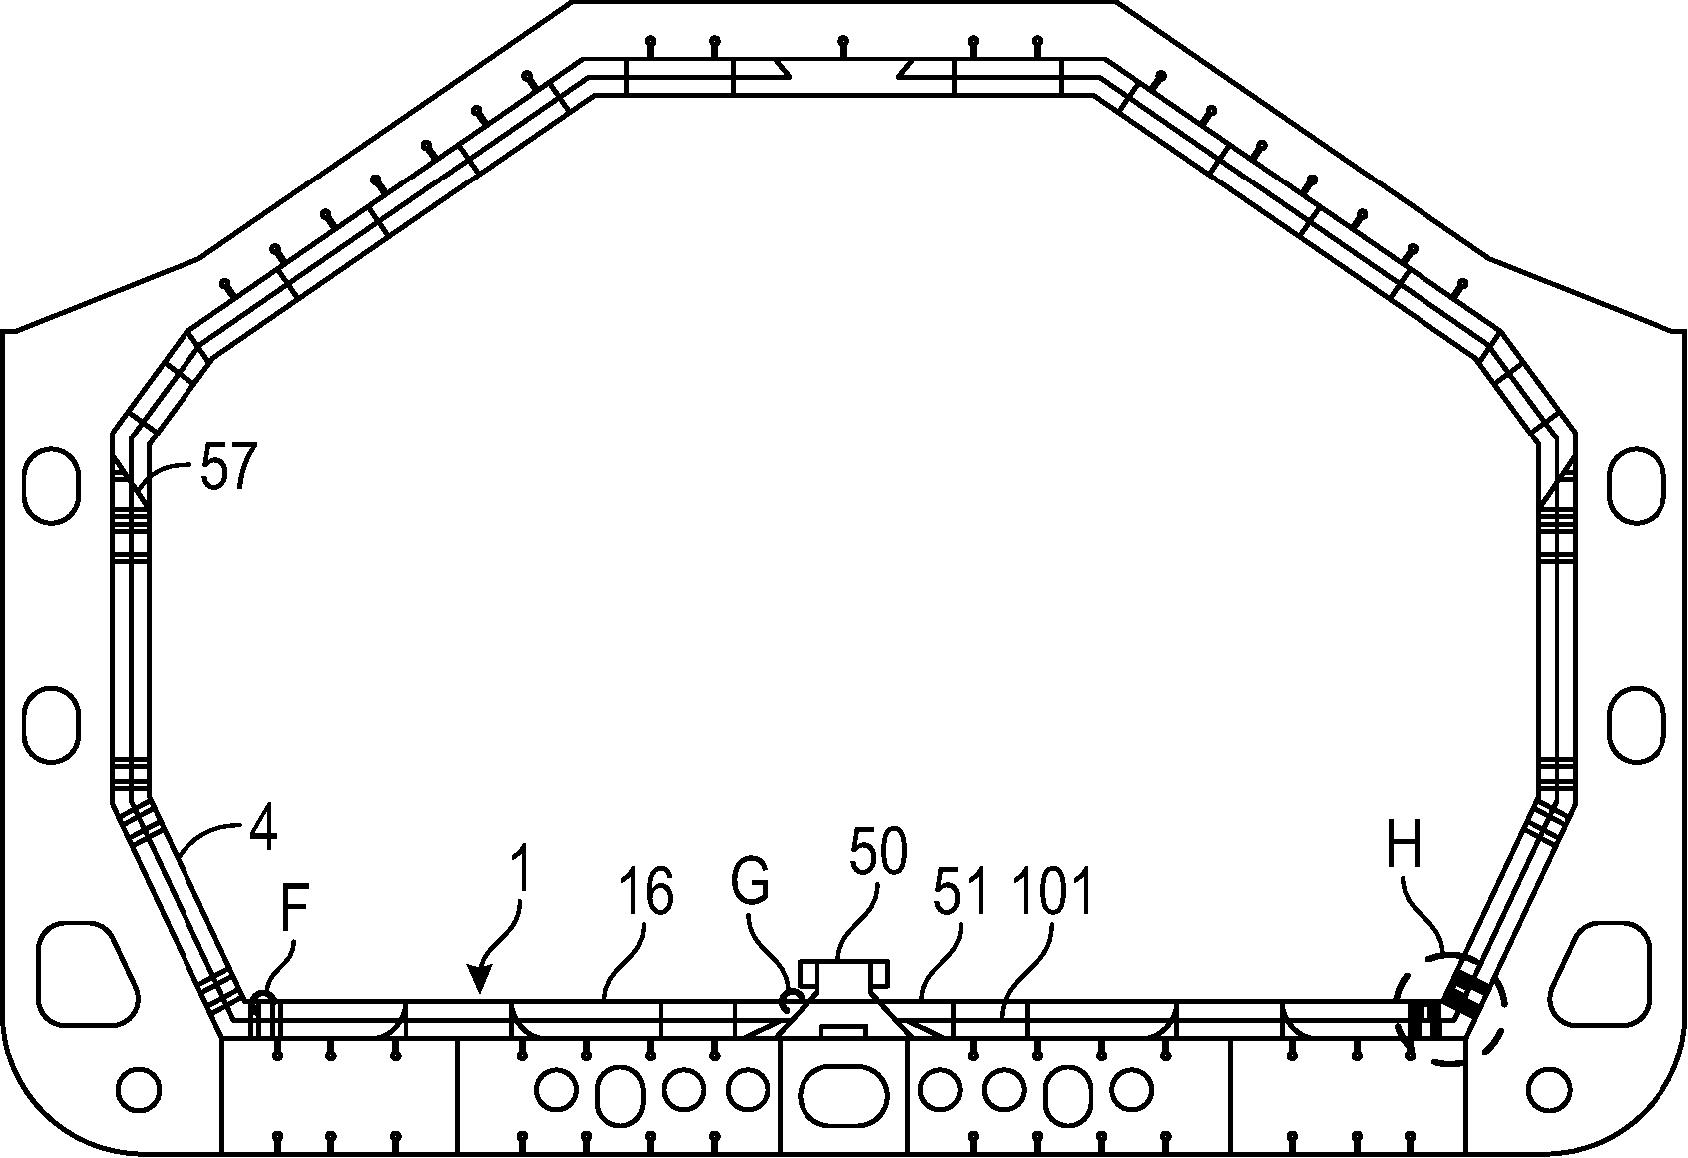 Figure GB2554862A_D0036